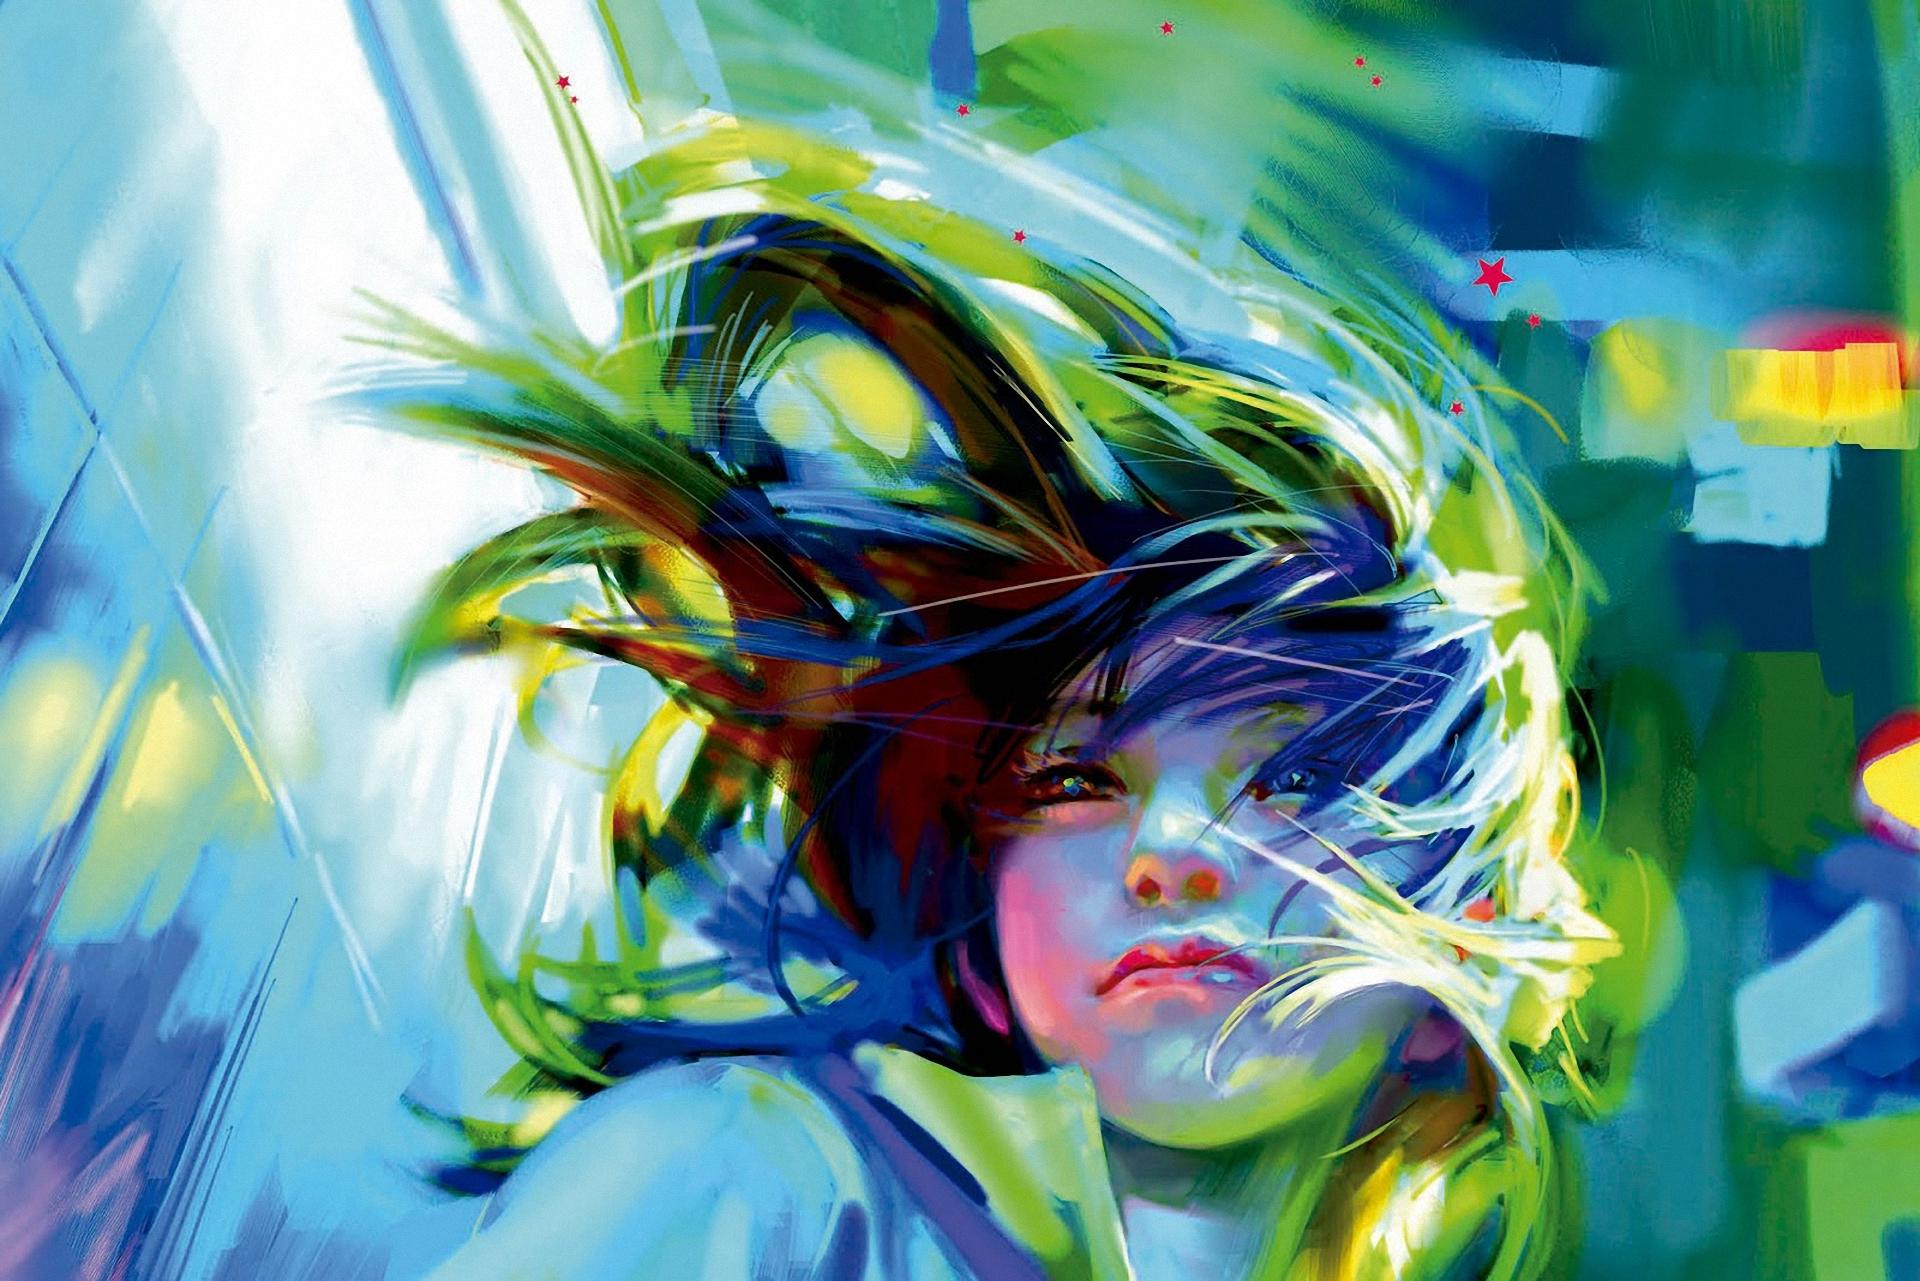 Wallpaper : Illustration, Anime, Green, Wind, ART, Color